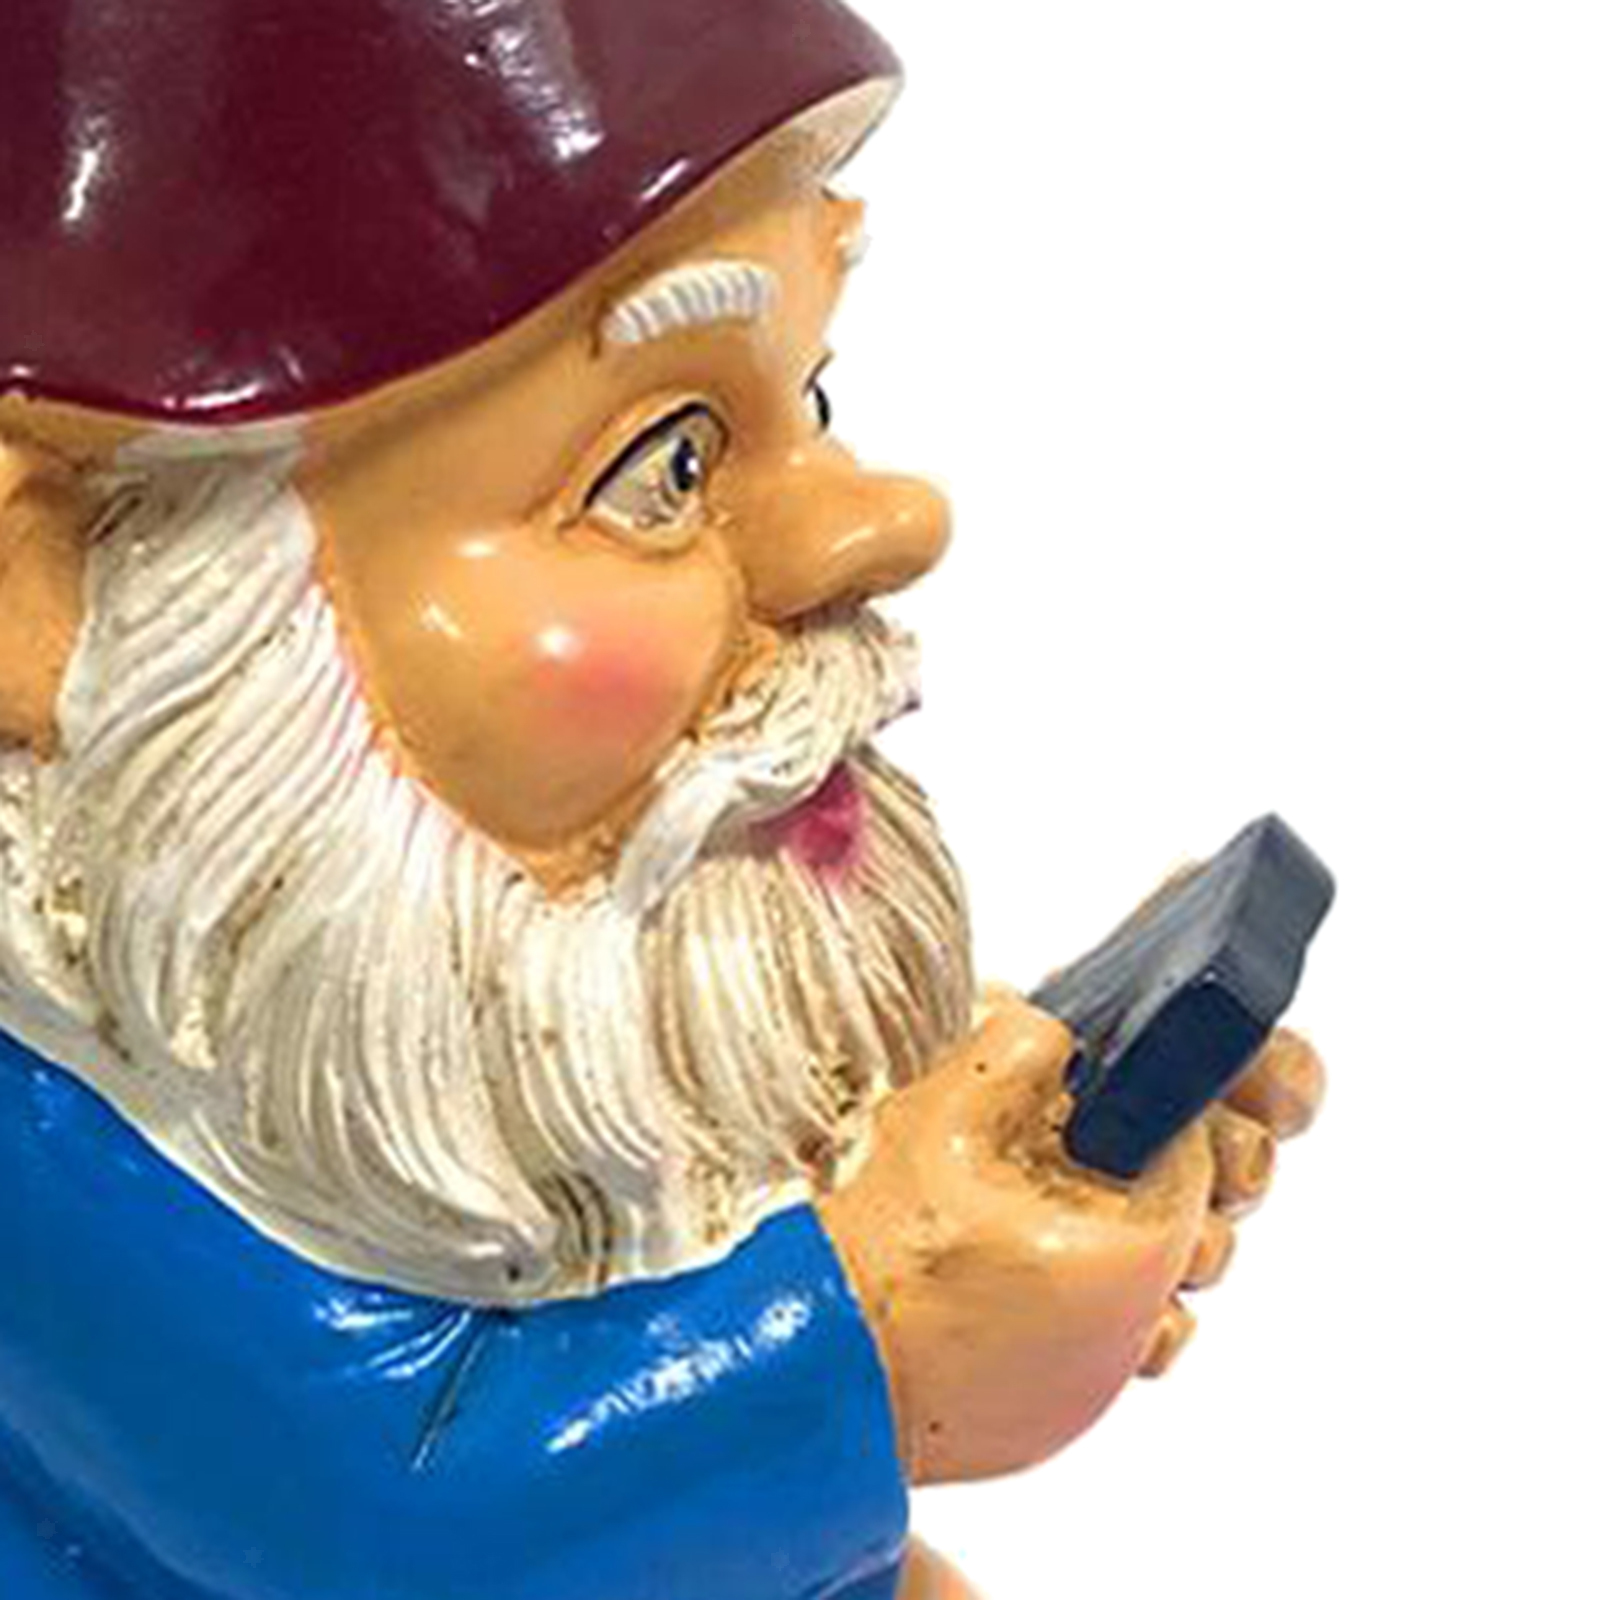 thumbnail 33 - Funny Resin Naughty Garden Gnome Statue Ornaments Villa Home Figurines Decor AU